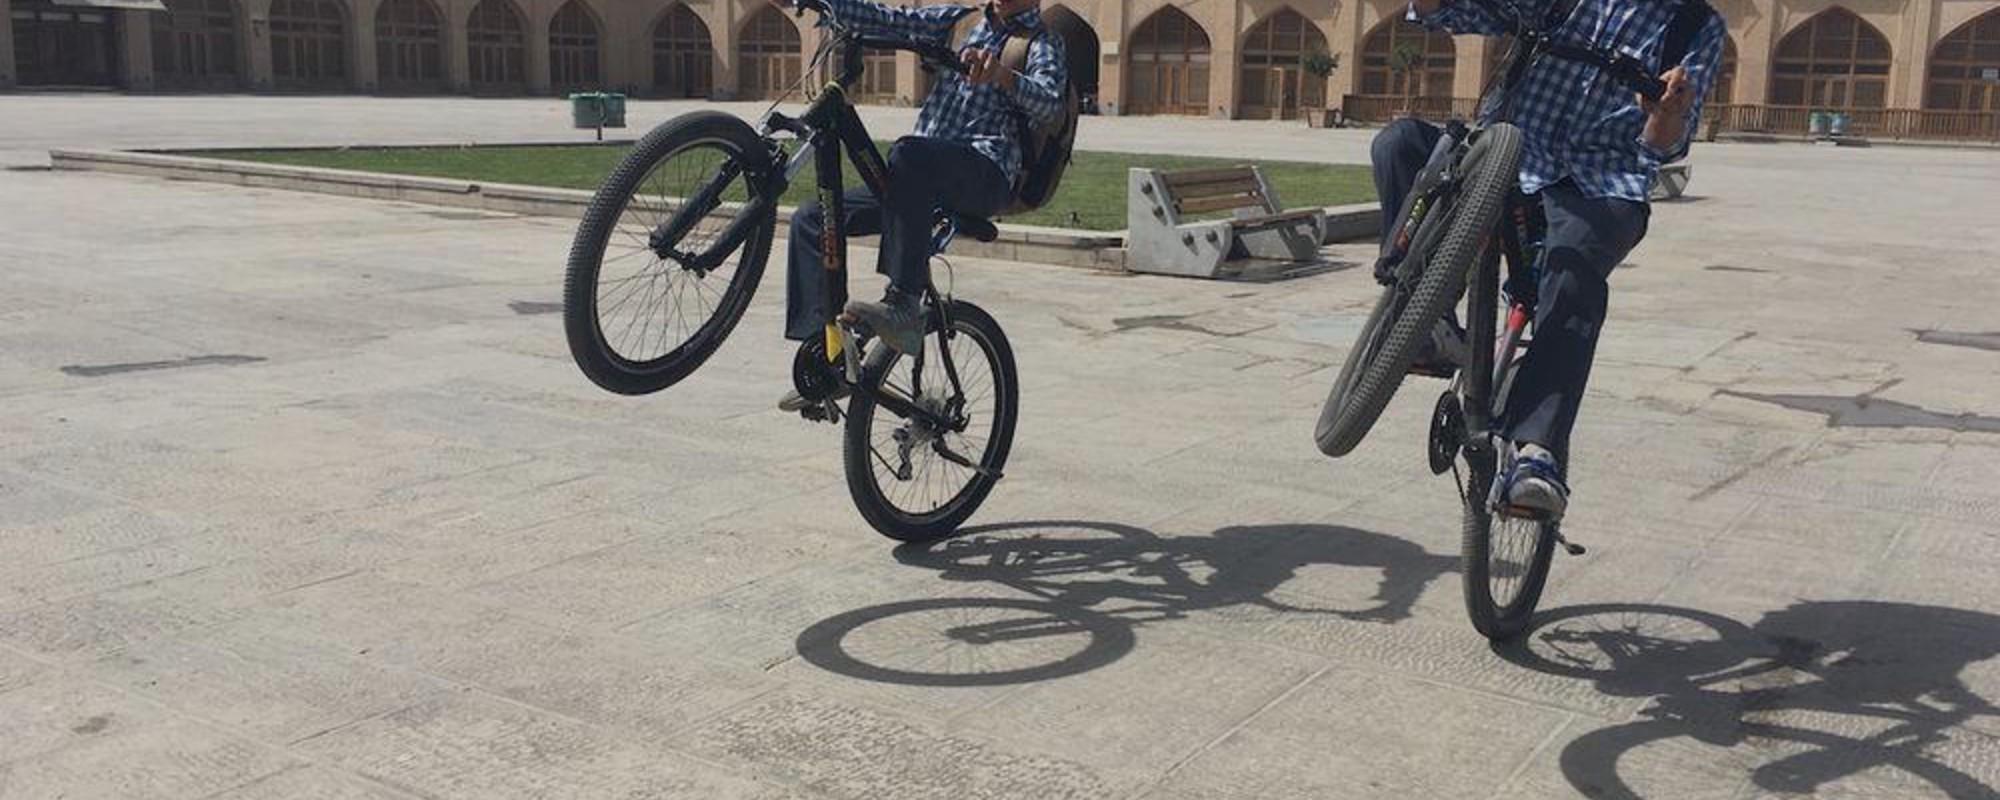 Mullahs, Skateparks, and Designer Knock-Offs: Inside Modern Iran